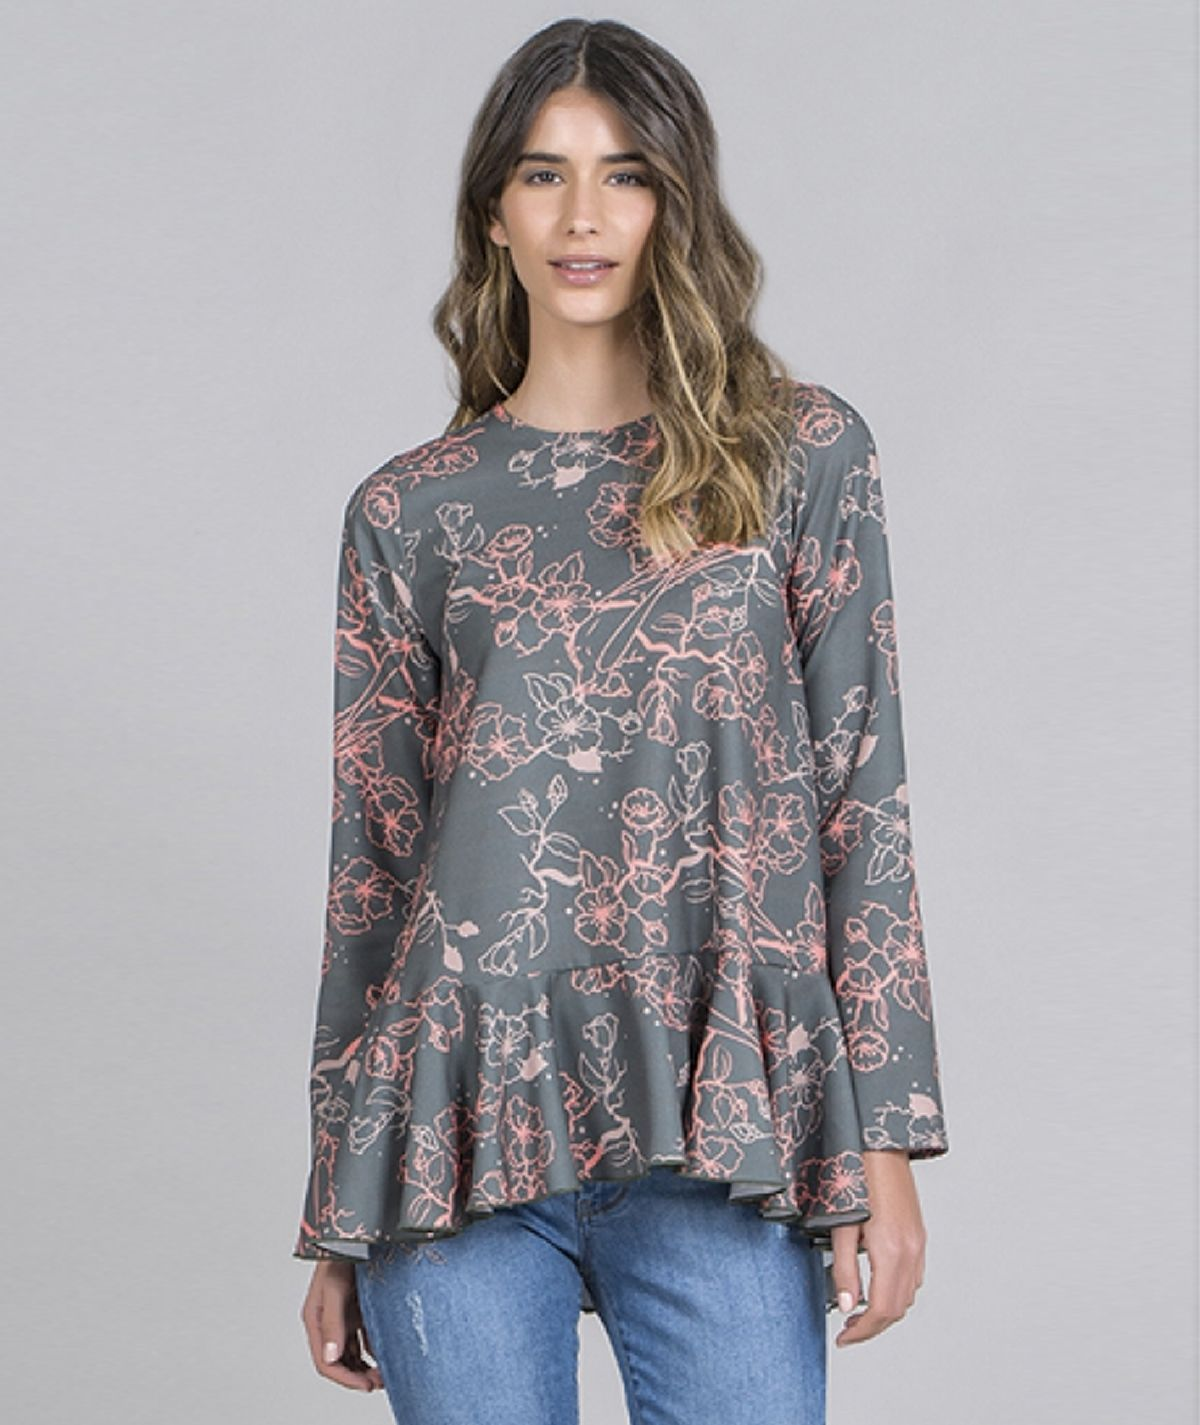 Blusa motivo floral